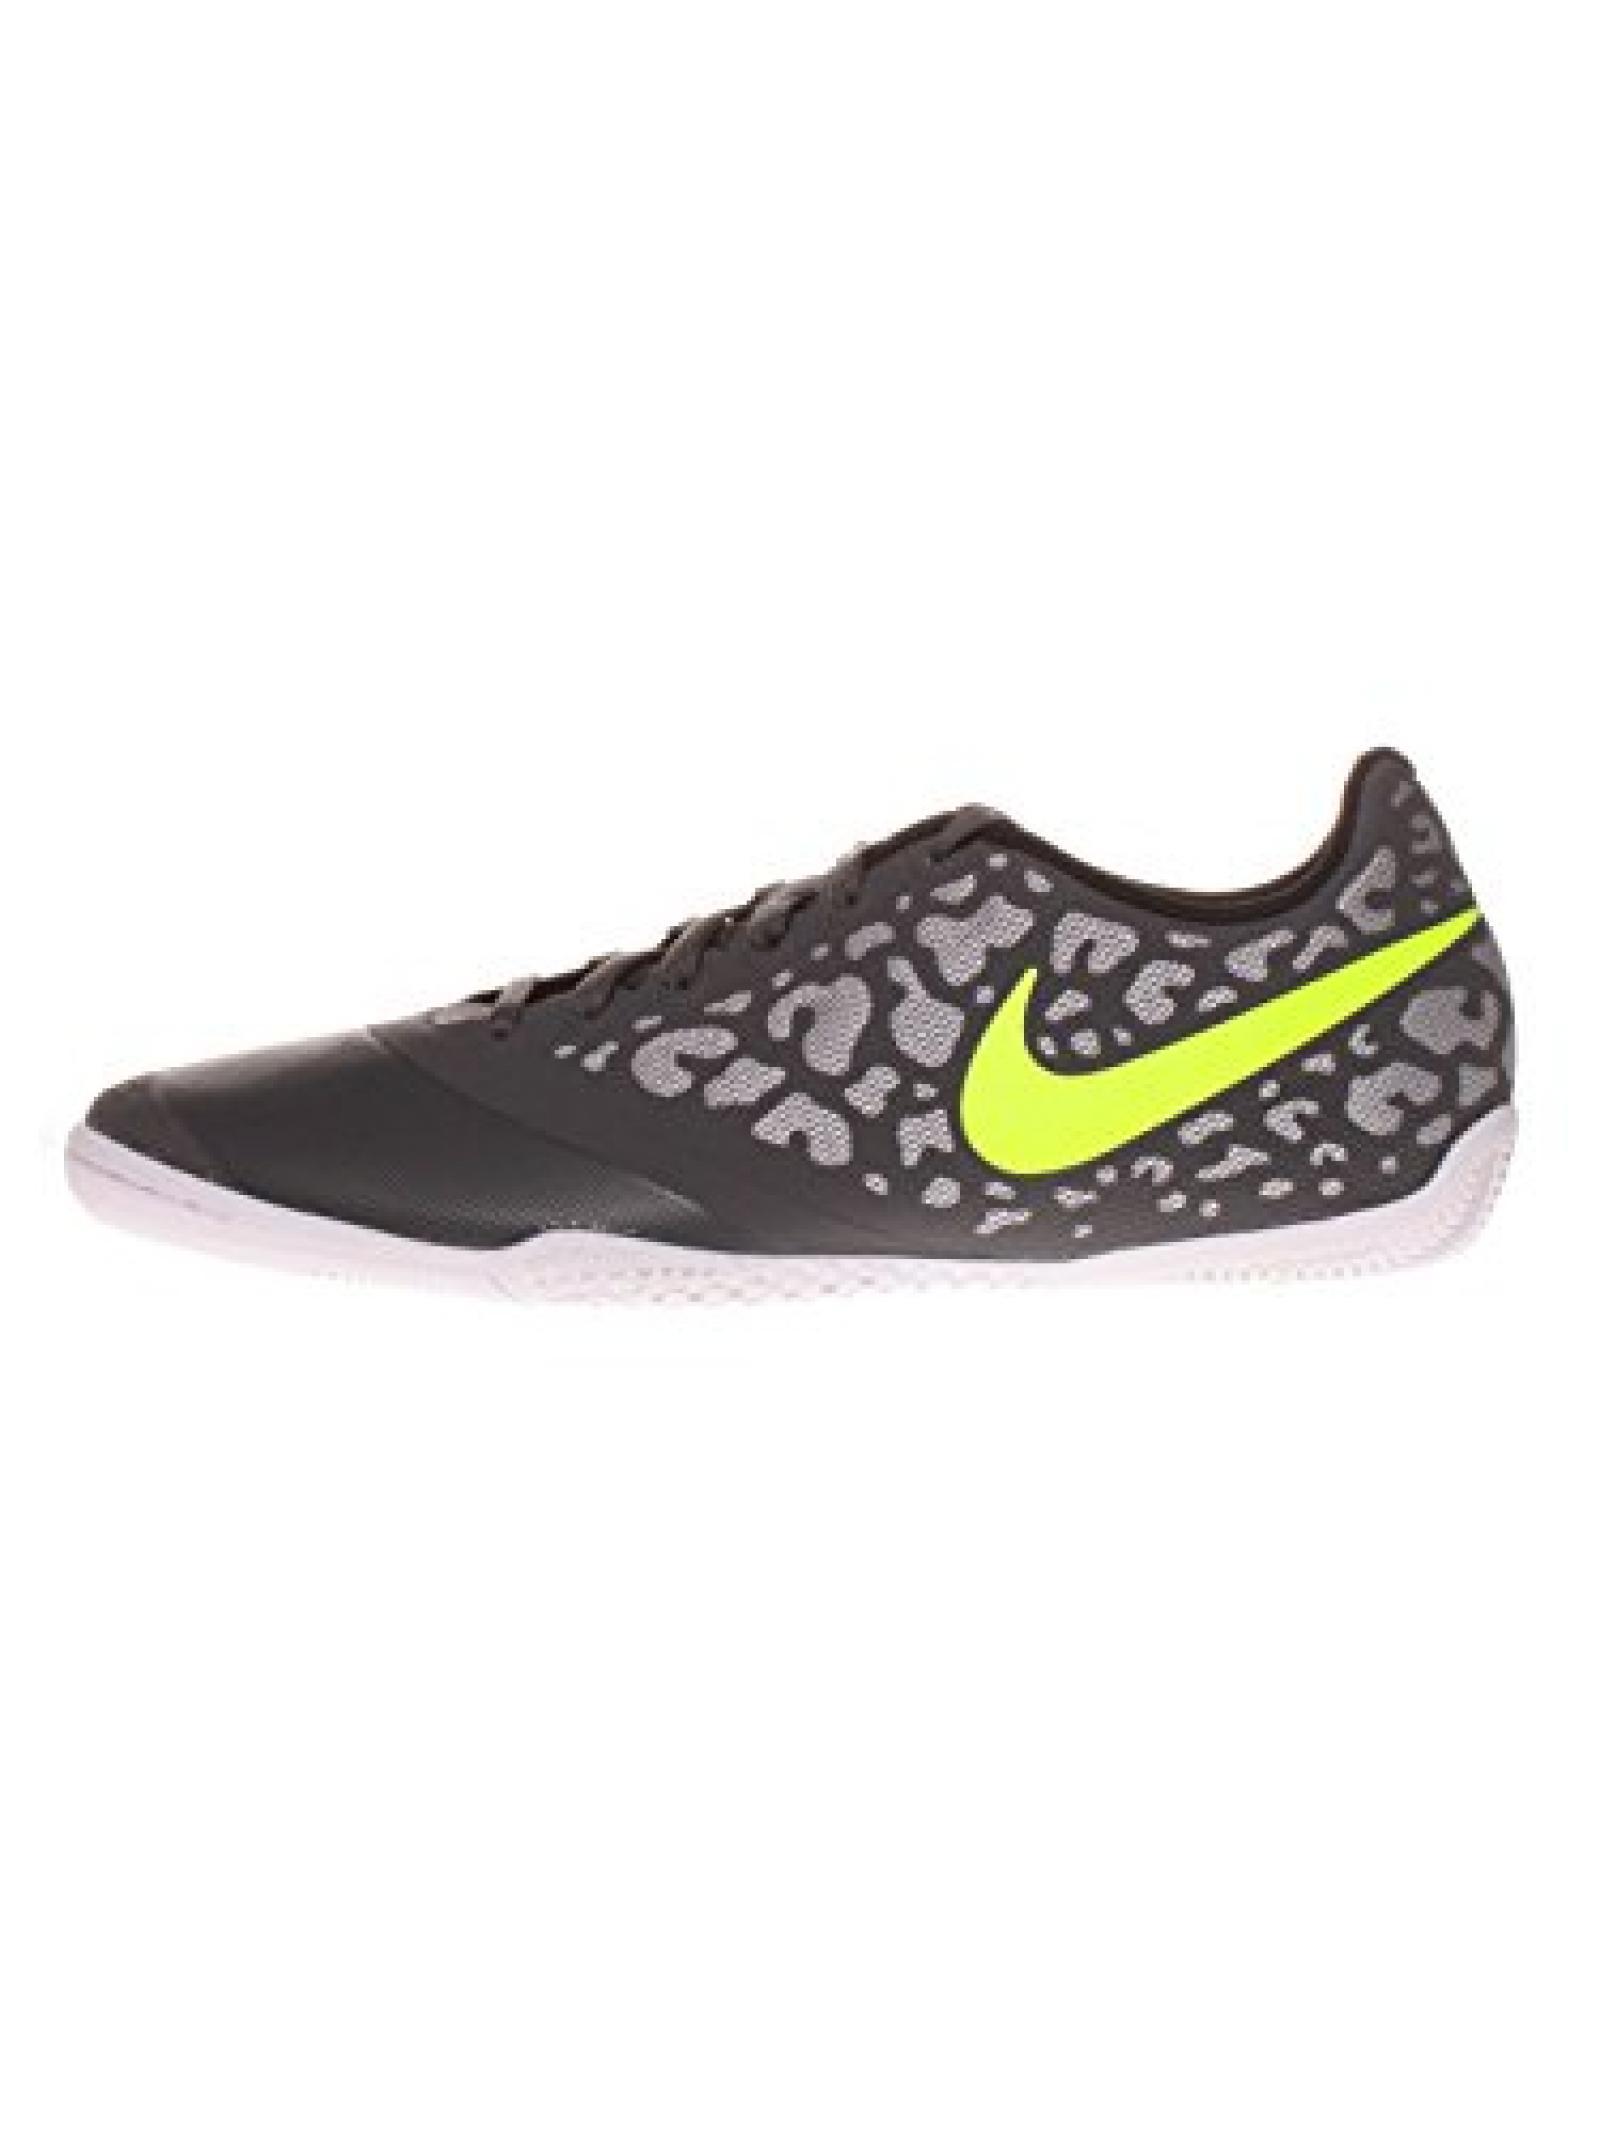 Nike 580455 070 Elastico Pro Ii Herren Sportschuhe - Fußball